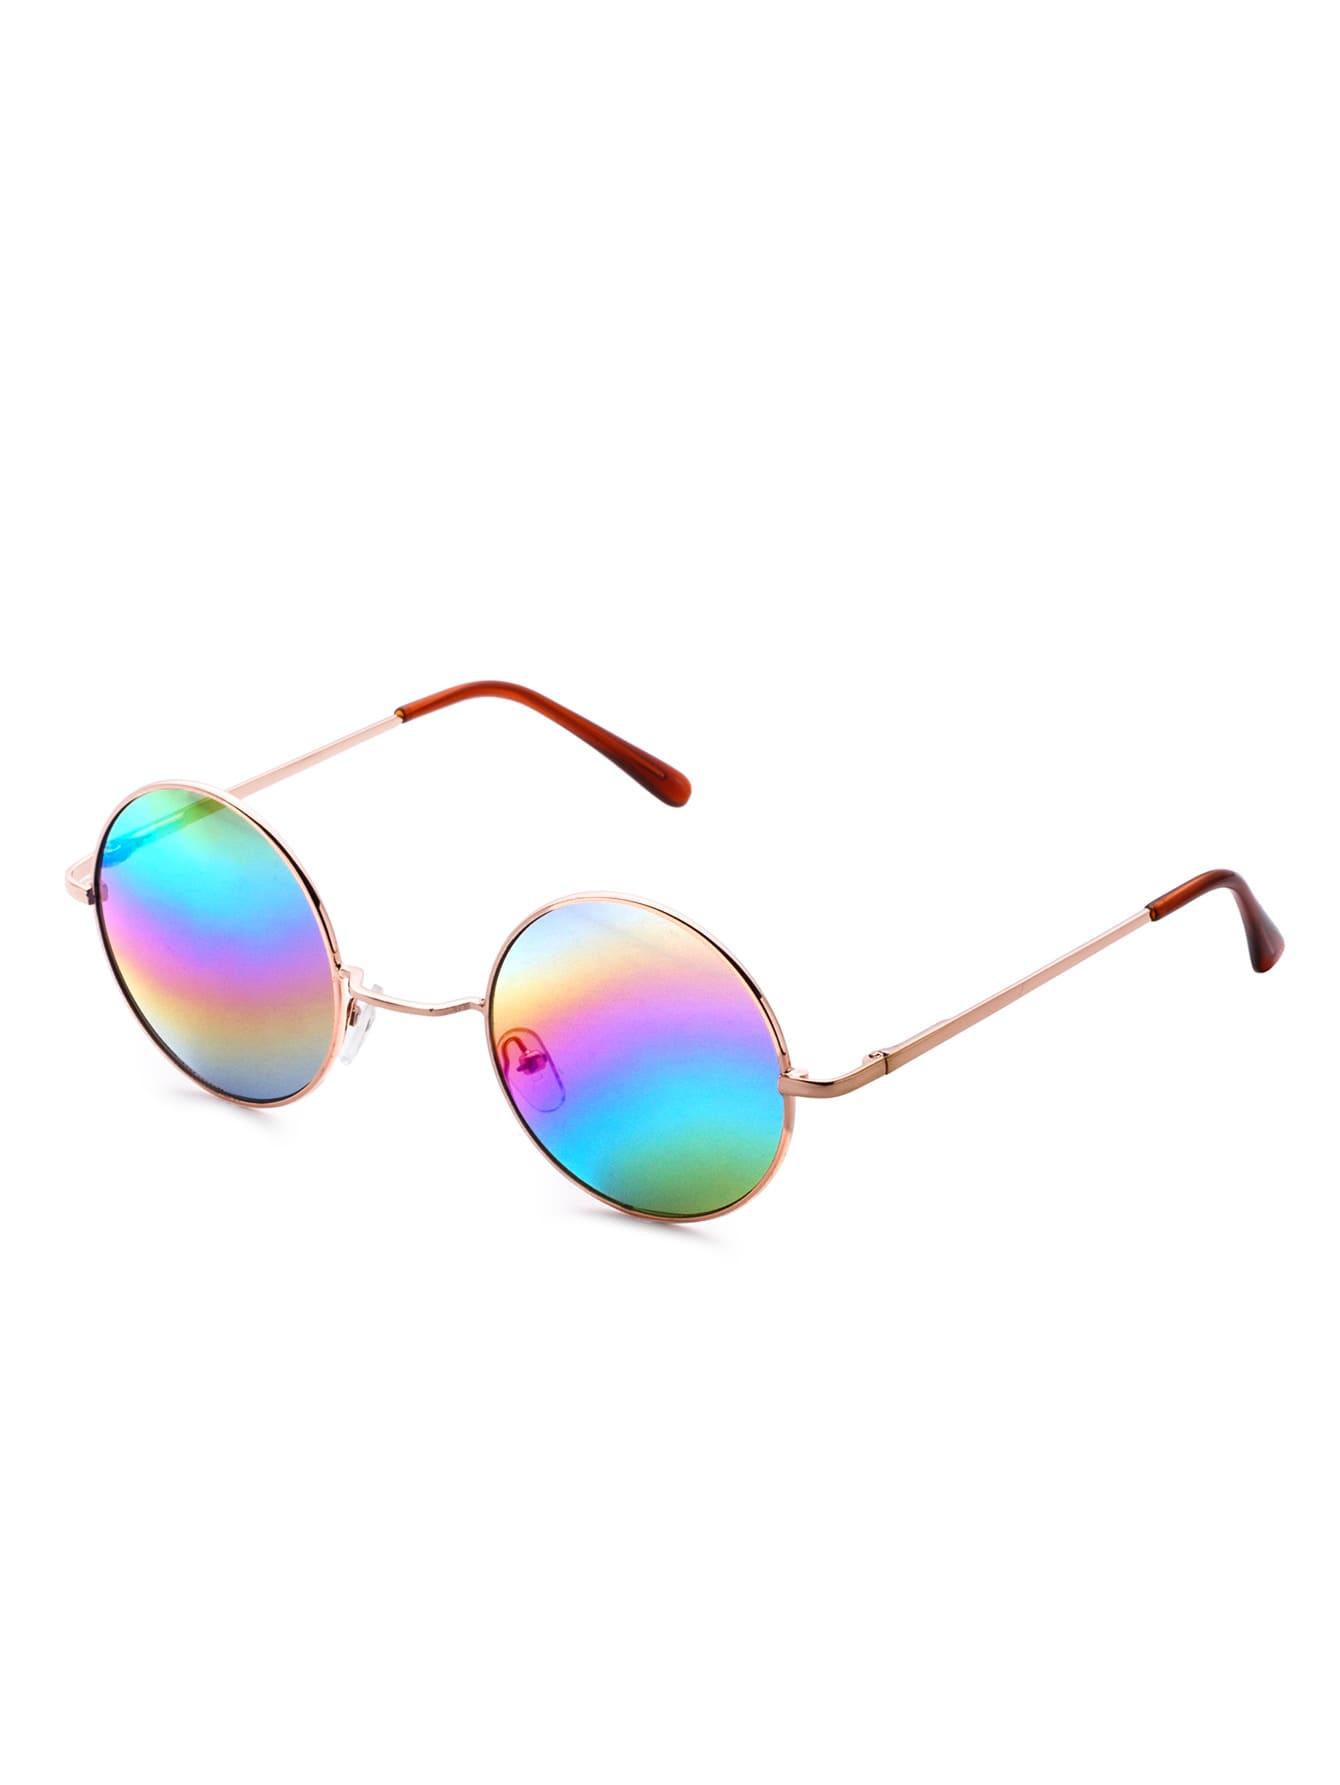 lunettes de soleil avec verre rond color dor french romwe. Black Bedroom Furniture Sets. Home Design Ideas